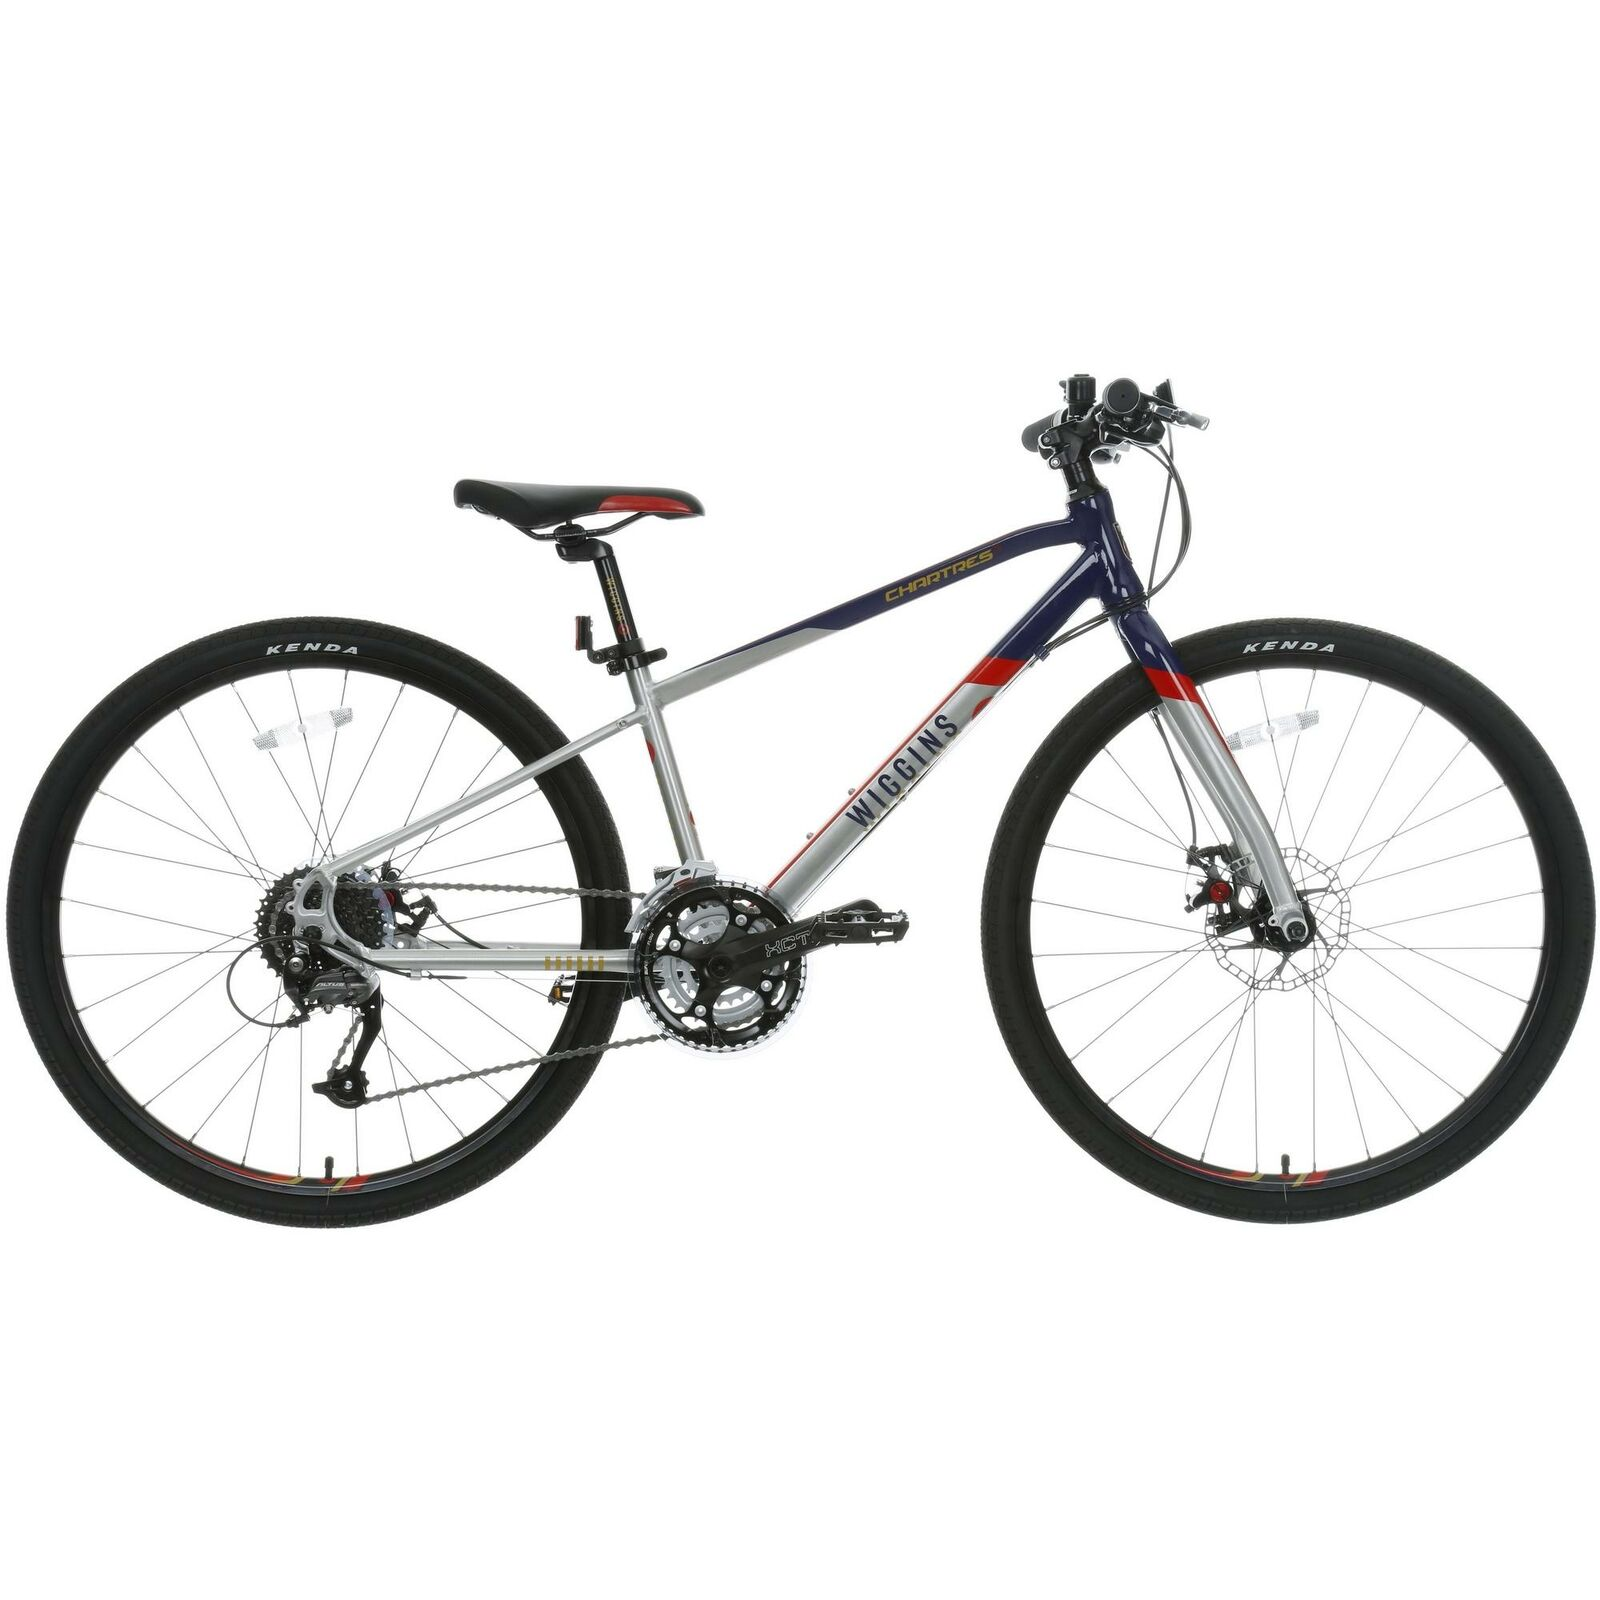 Wiggins Chartres Boys Girls Hybrid Bike Bicycle 27 Shimano Speed 26  Inch Wheels